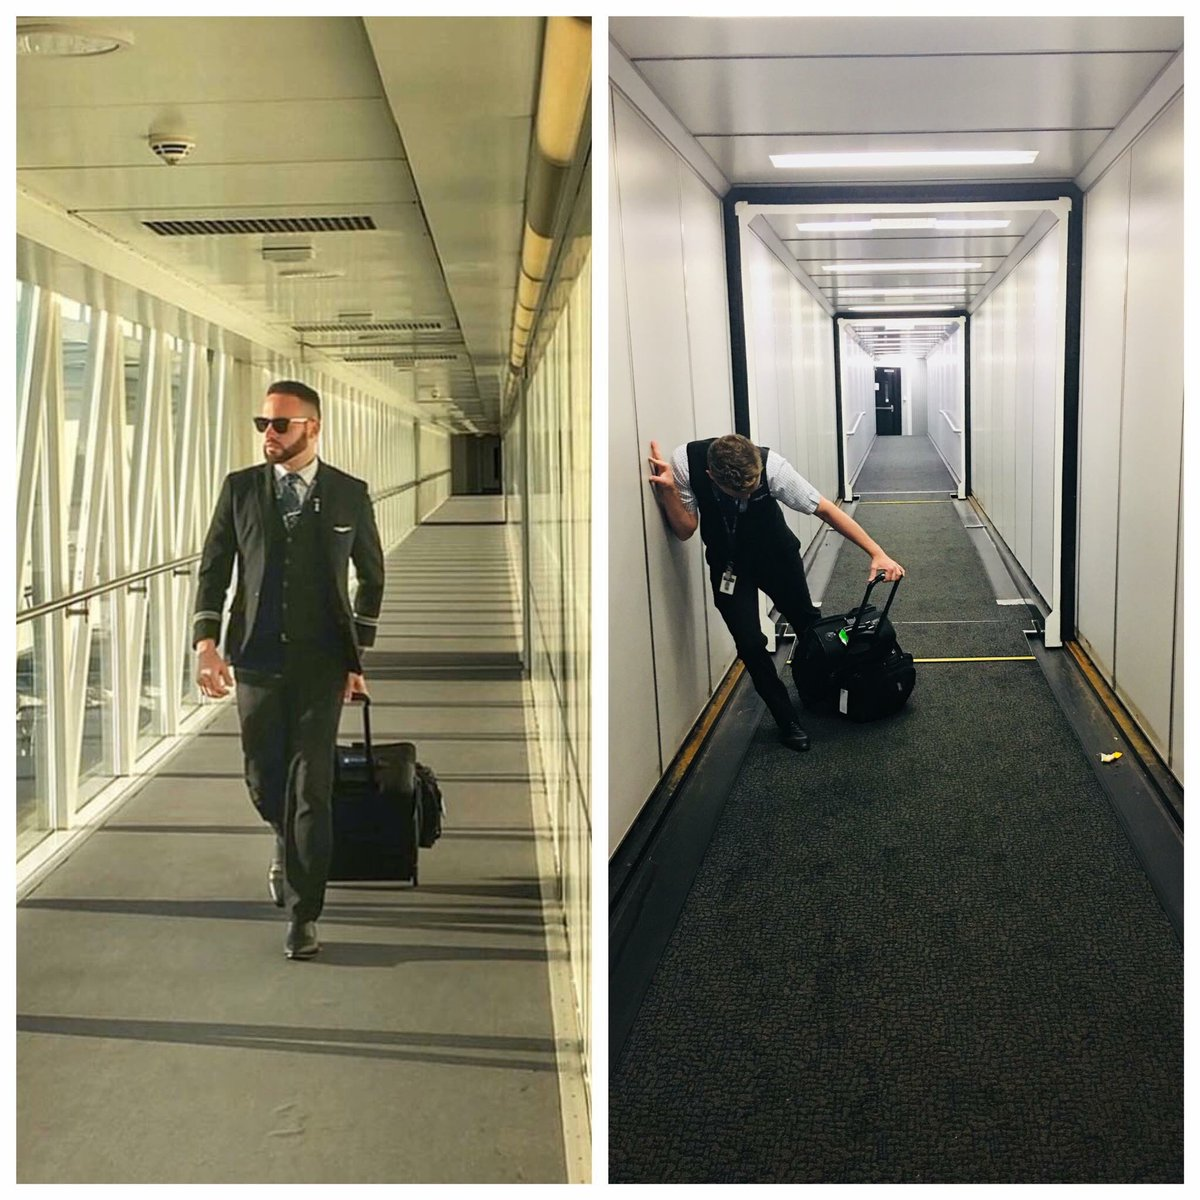 International vs. domestic flying #crewlife<br>http://pic.twitter.com/IerQsDgtSg